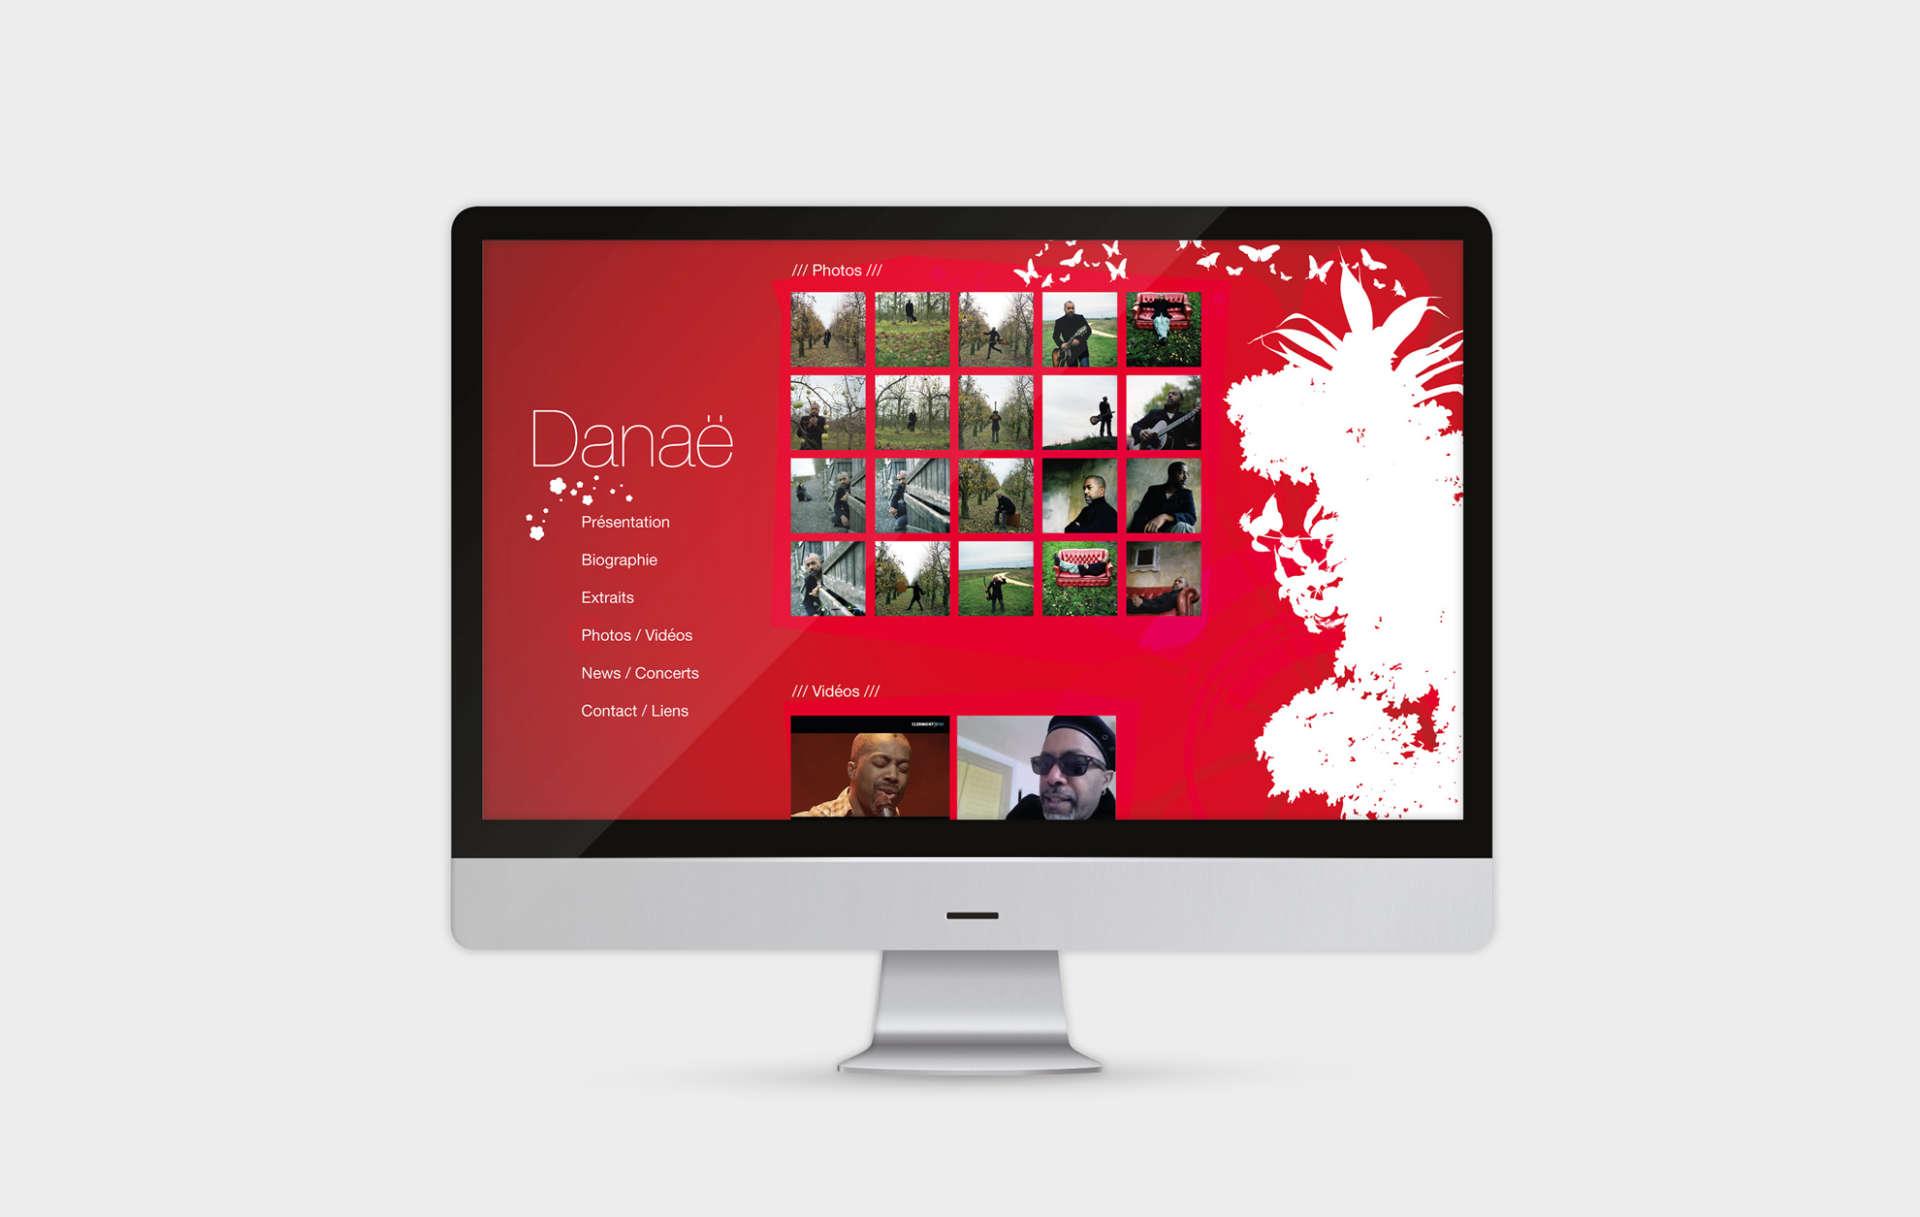 danae_Paris-Pap_site-05